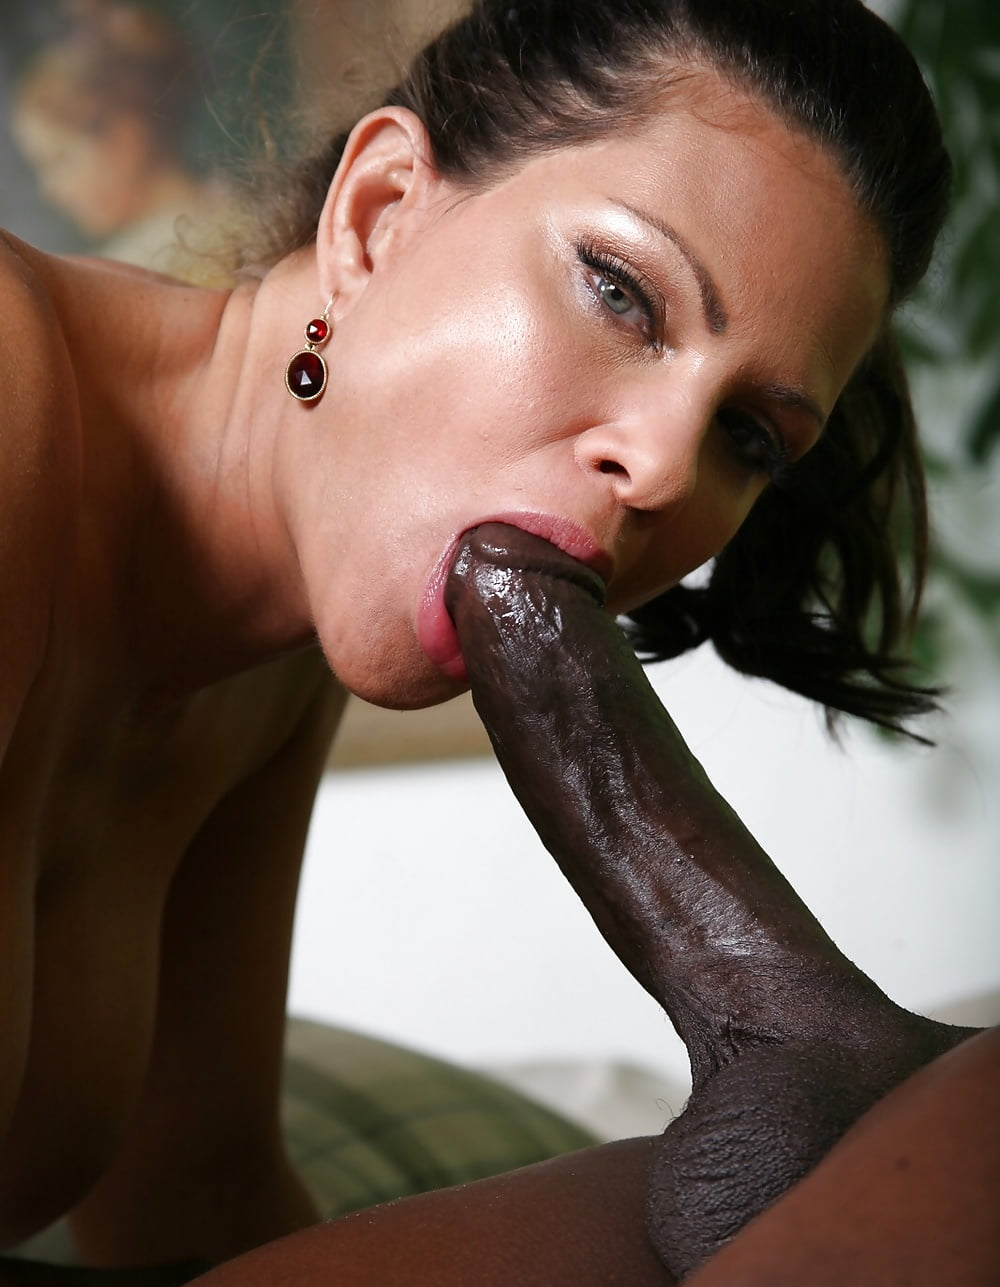 Girls love anal licking